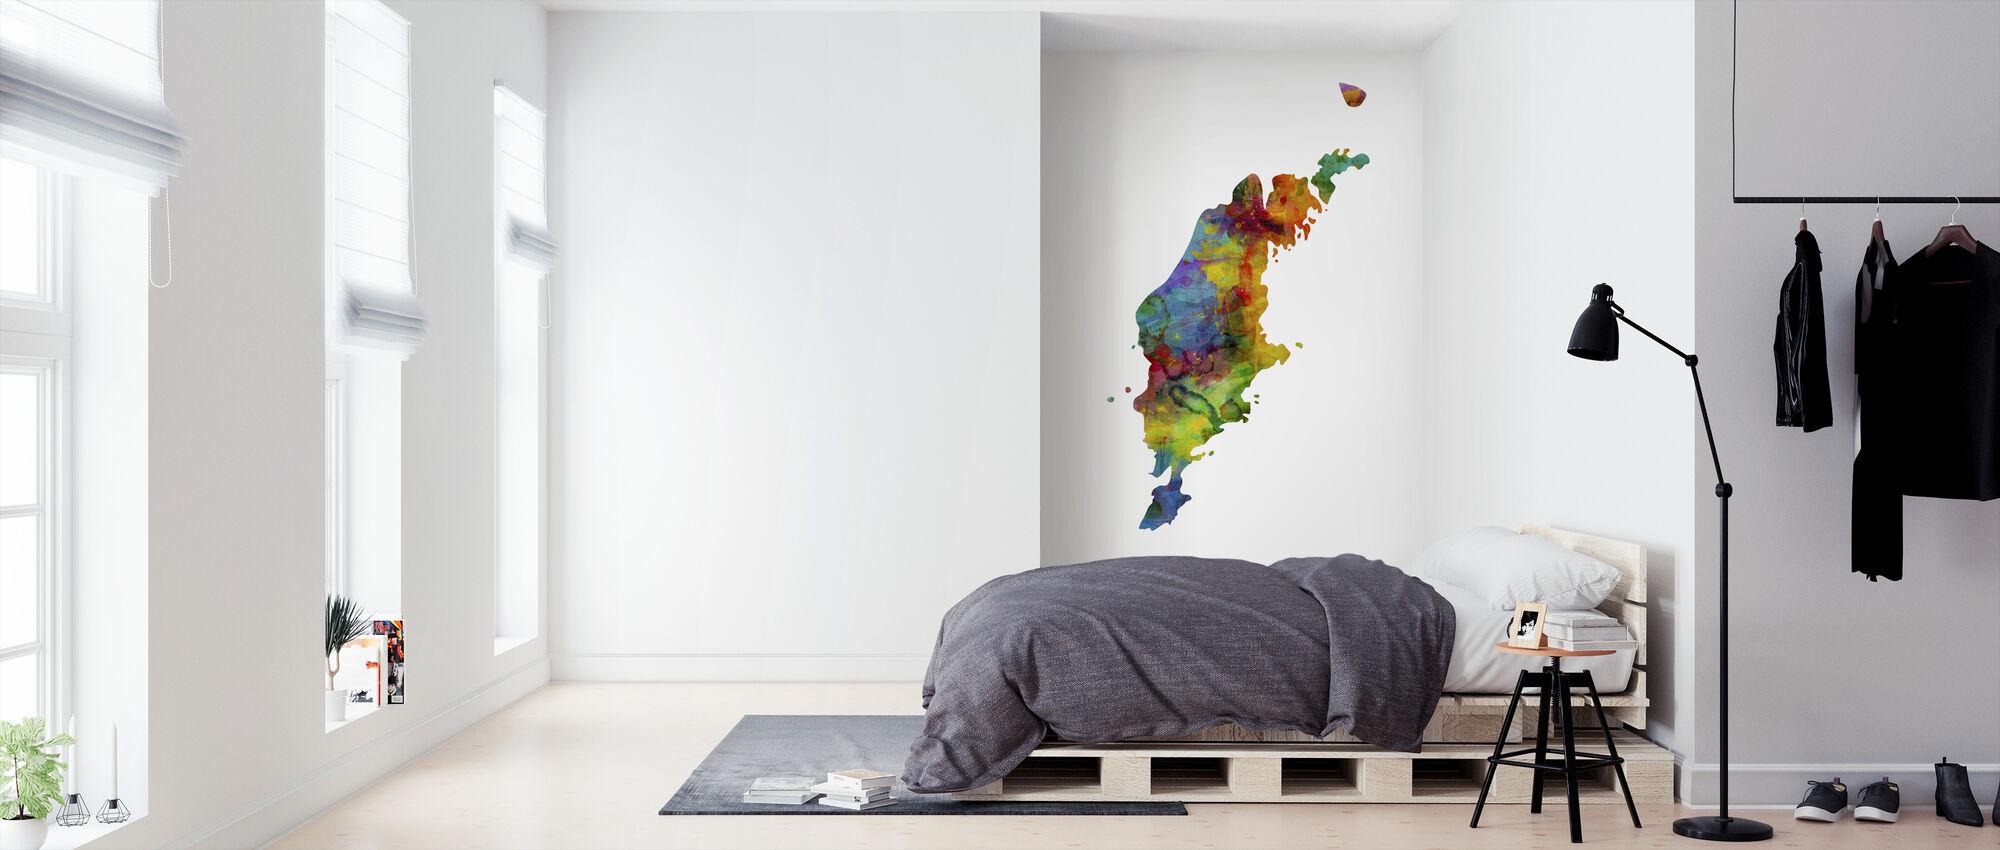 Gotland Watercolor Map - Wallpaper - Bedroom